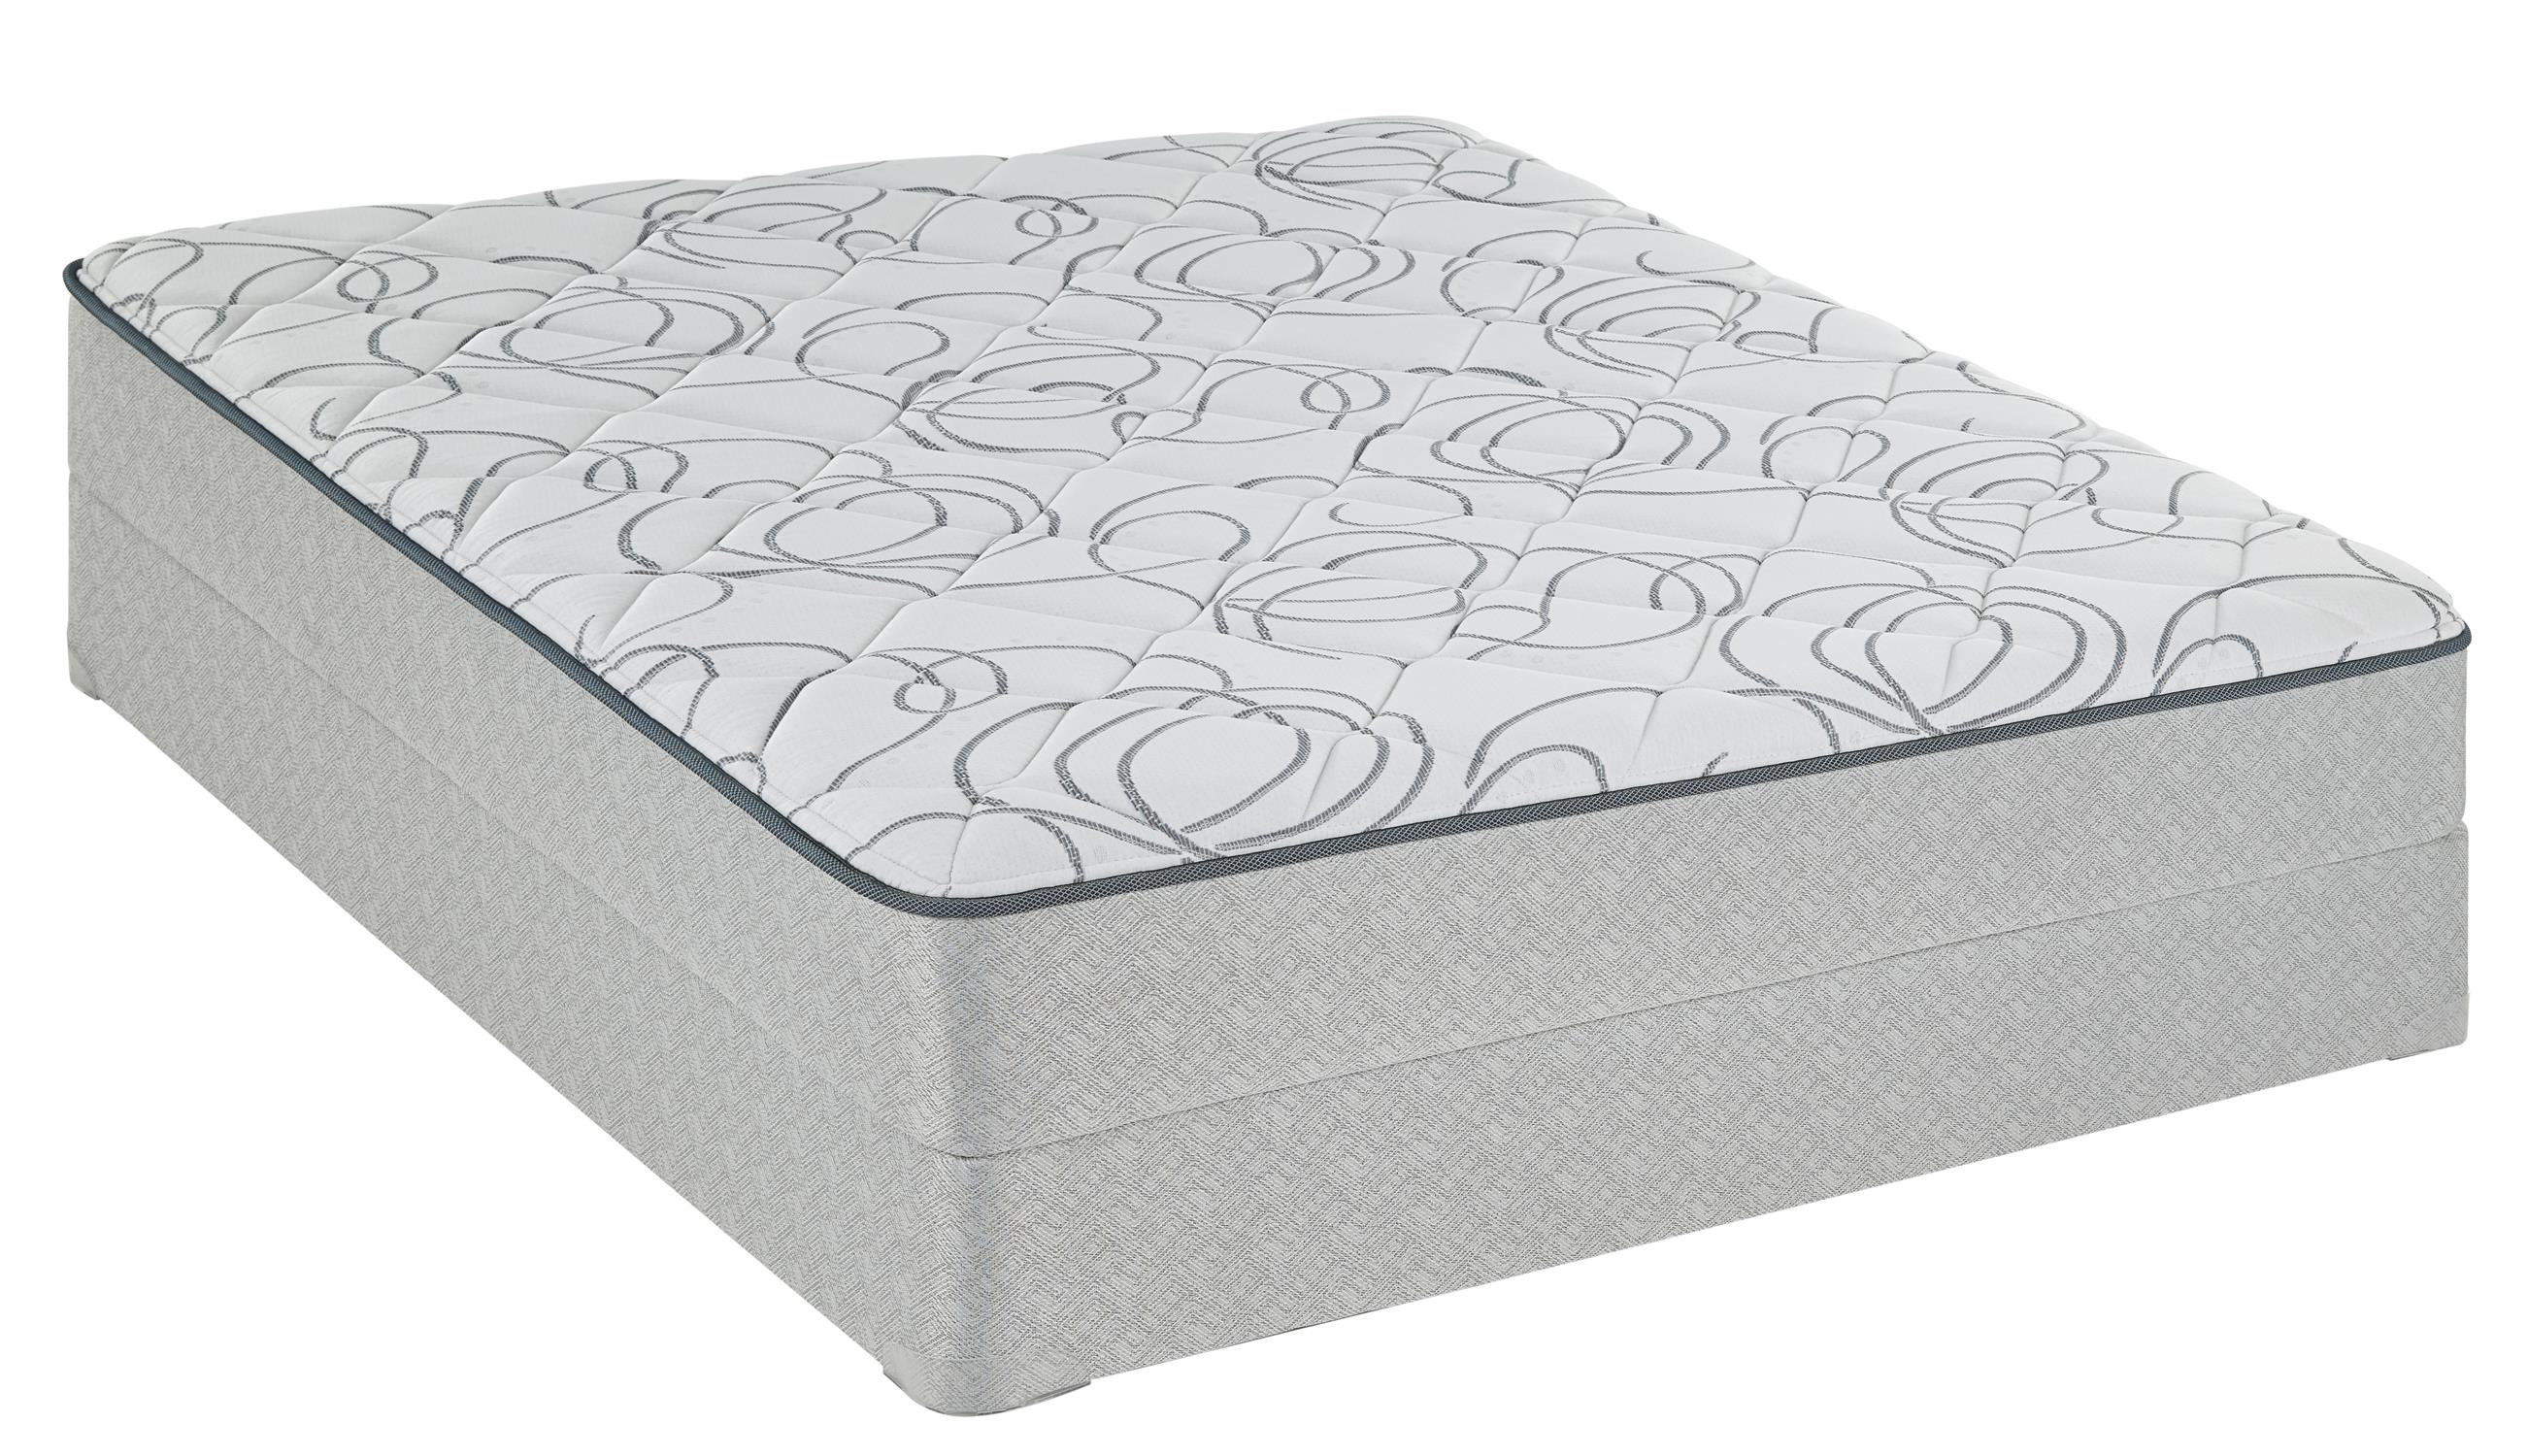 Sealy Sealy Watsonia King Firm Mattress Set - Item Number: FirmTT-K+2xFoundationK